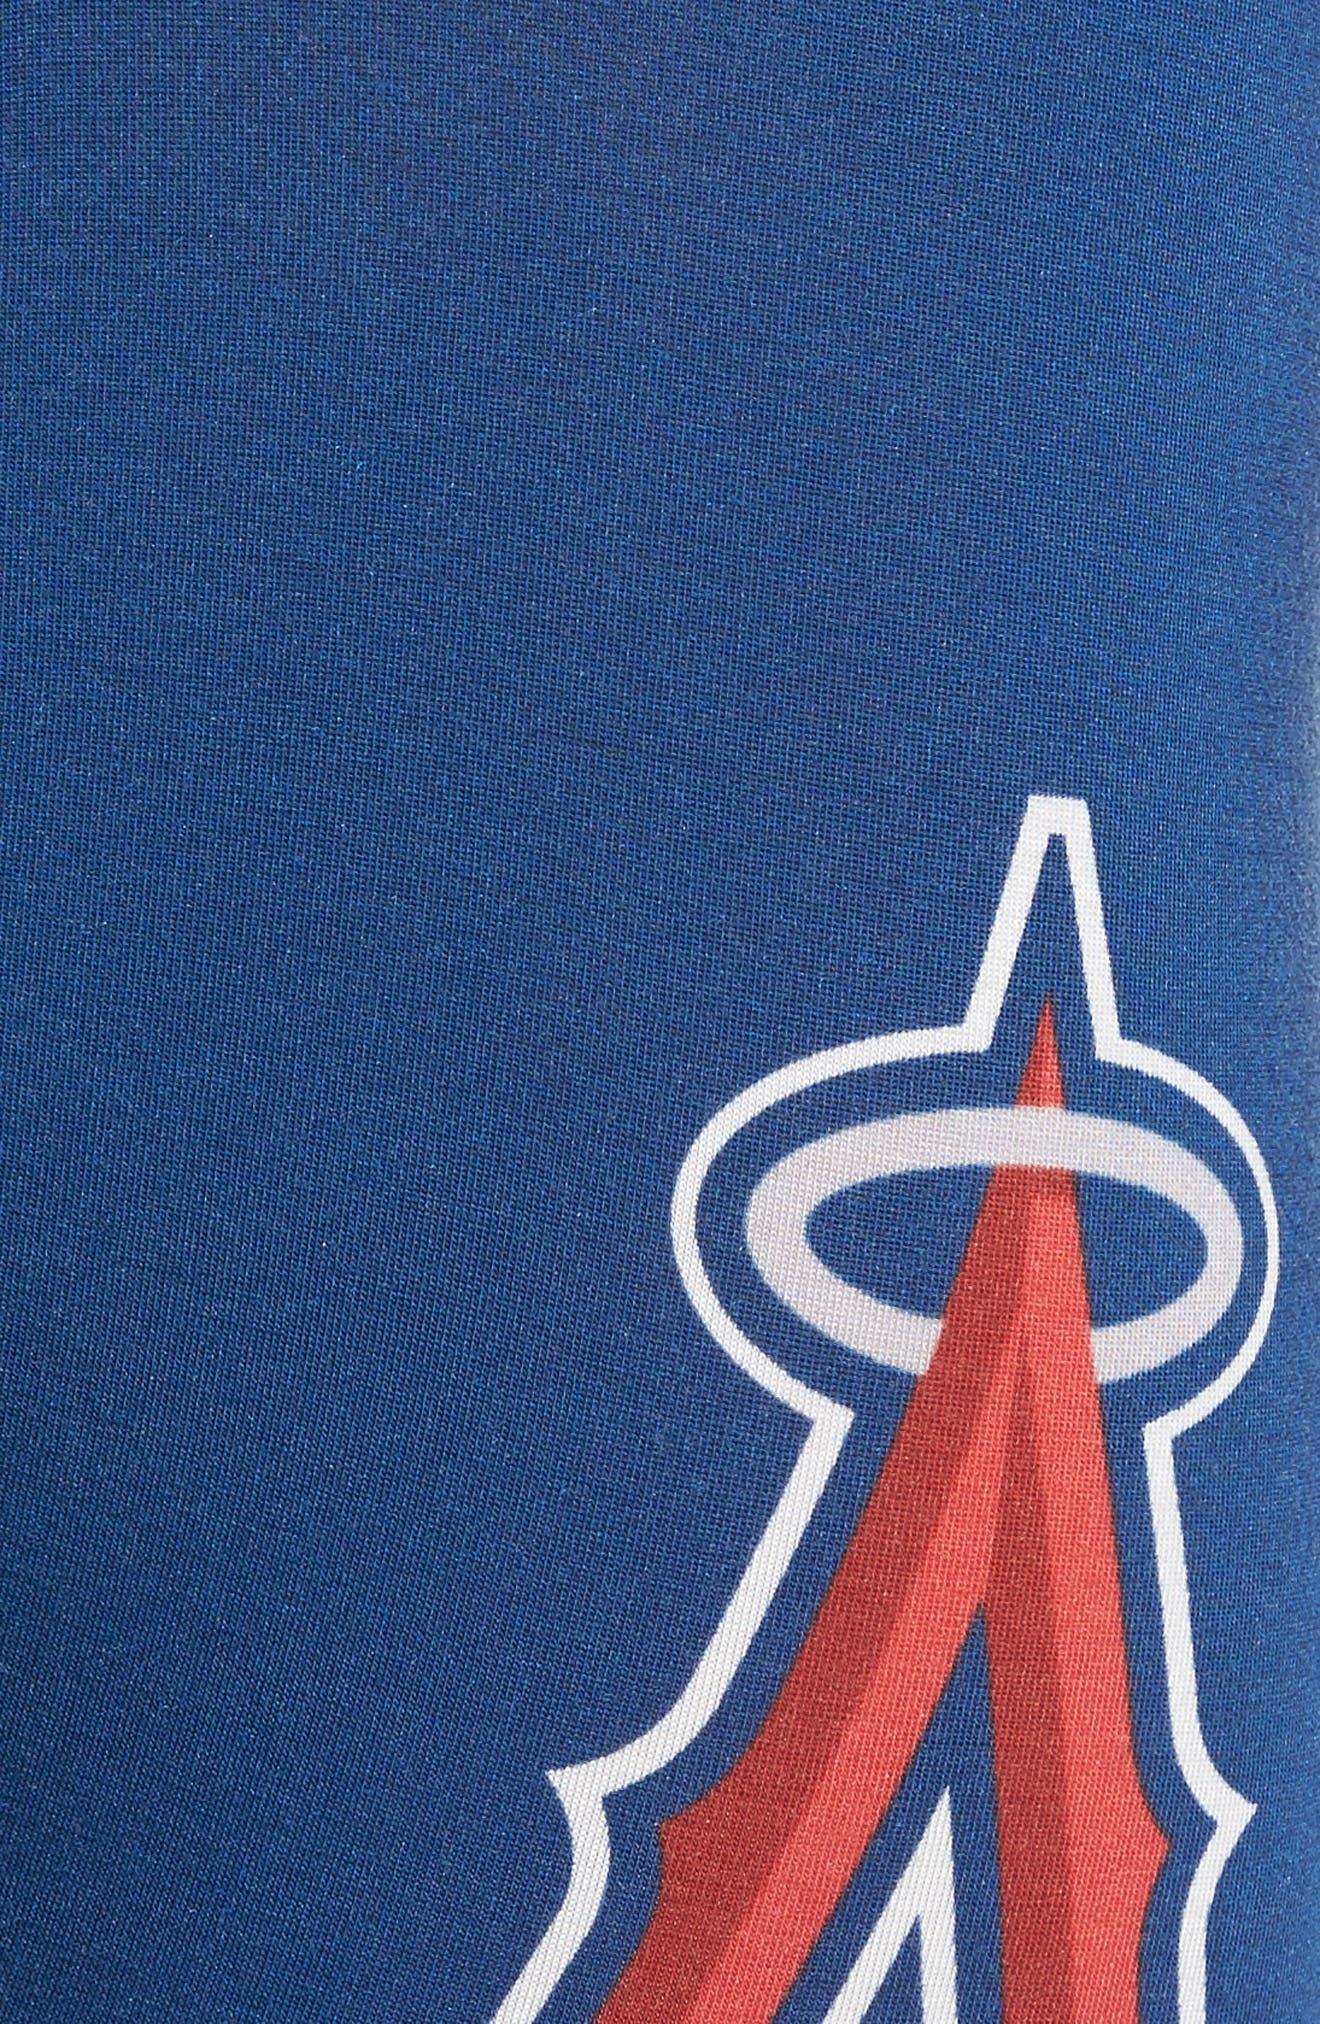 Angels Tie Dye Stretch Modal Boxer Briefs,                             Alternate thumbnail 4, color,                             Blue